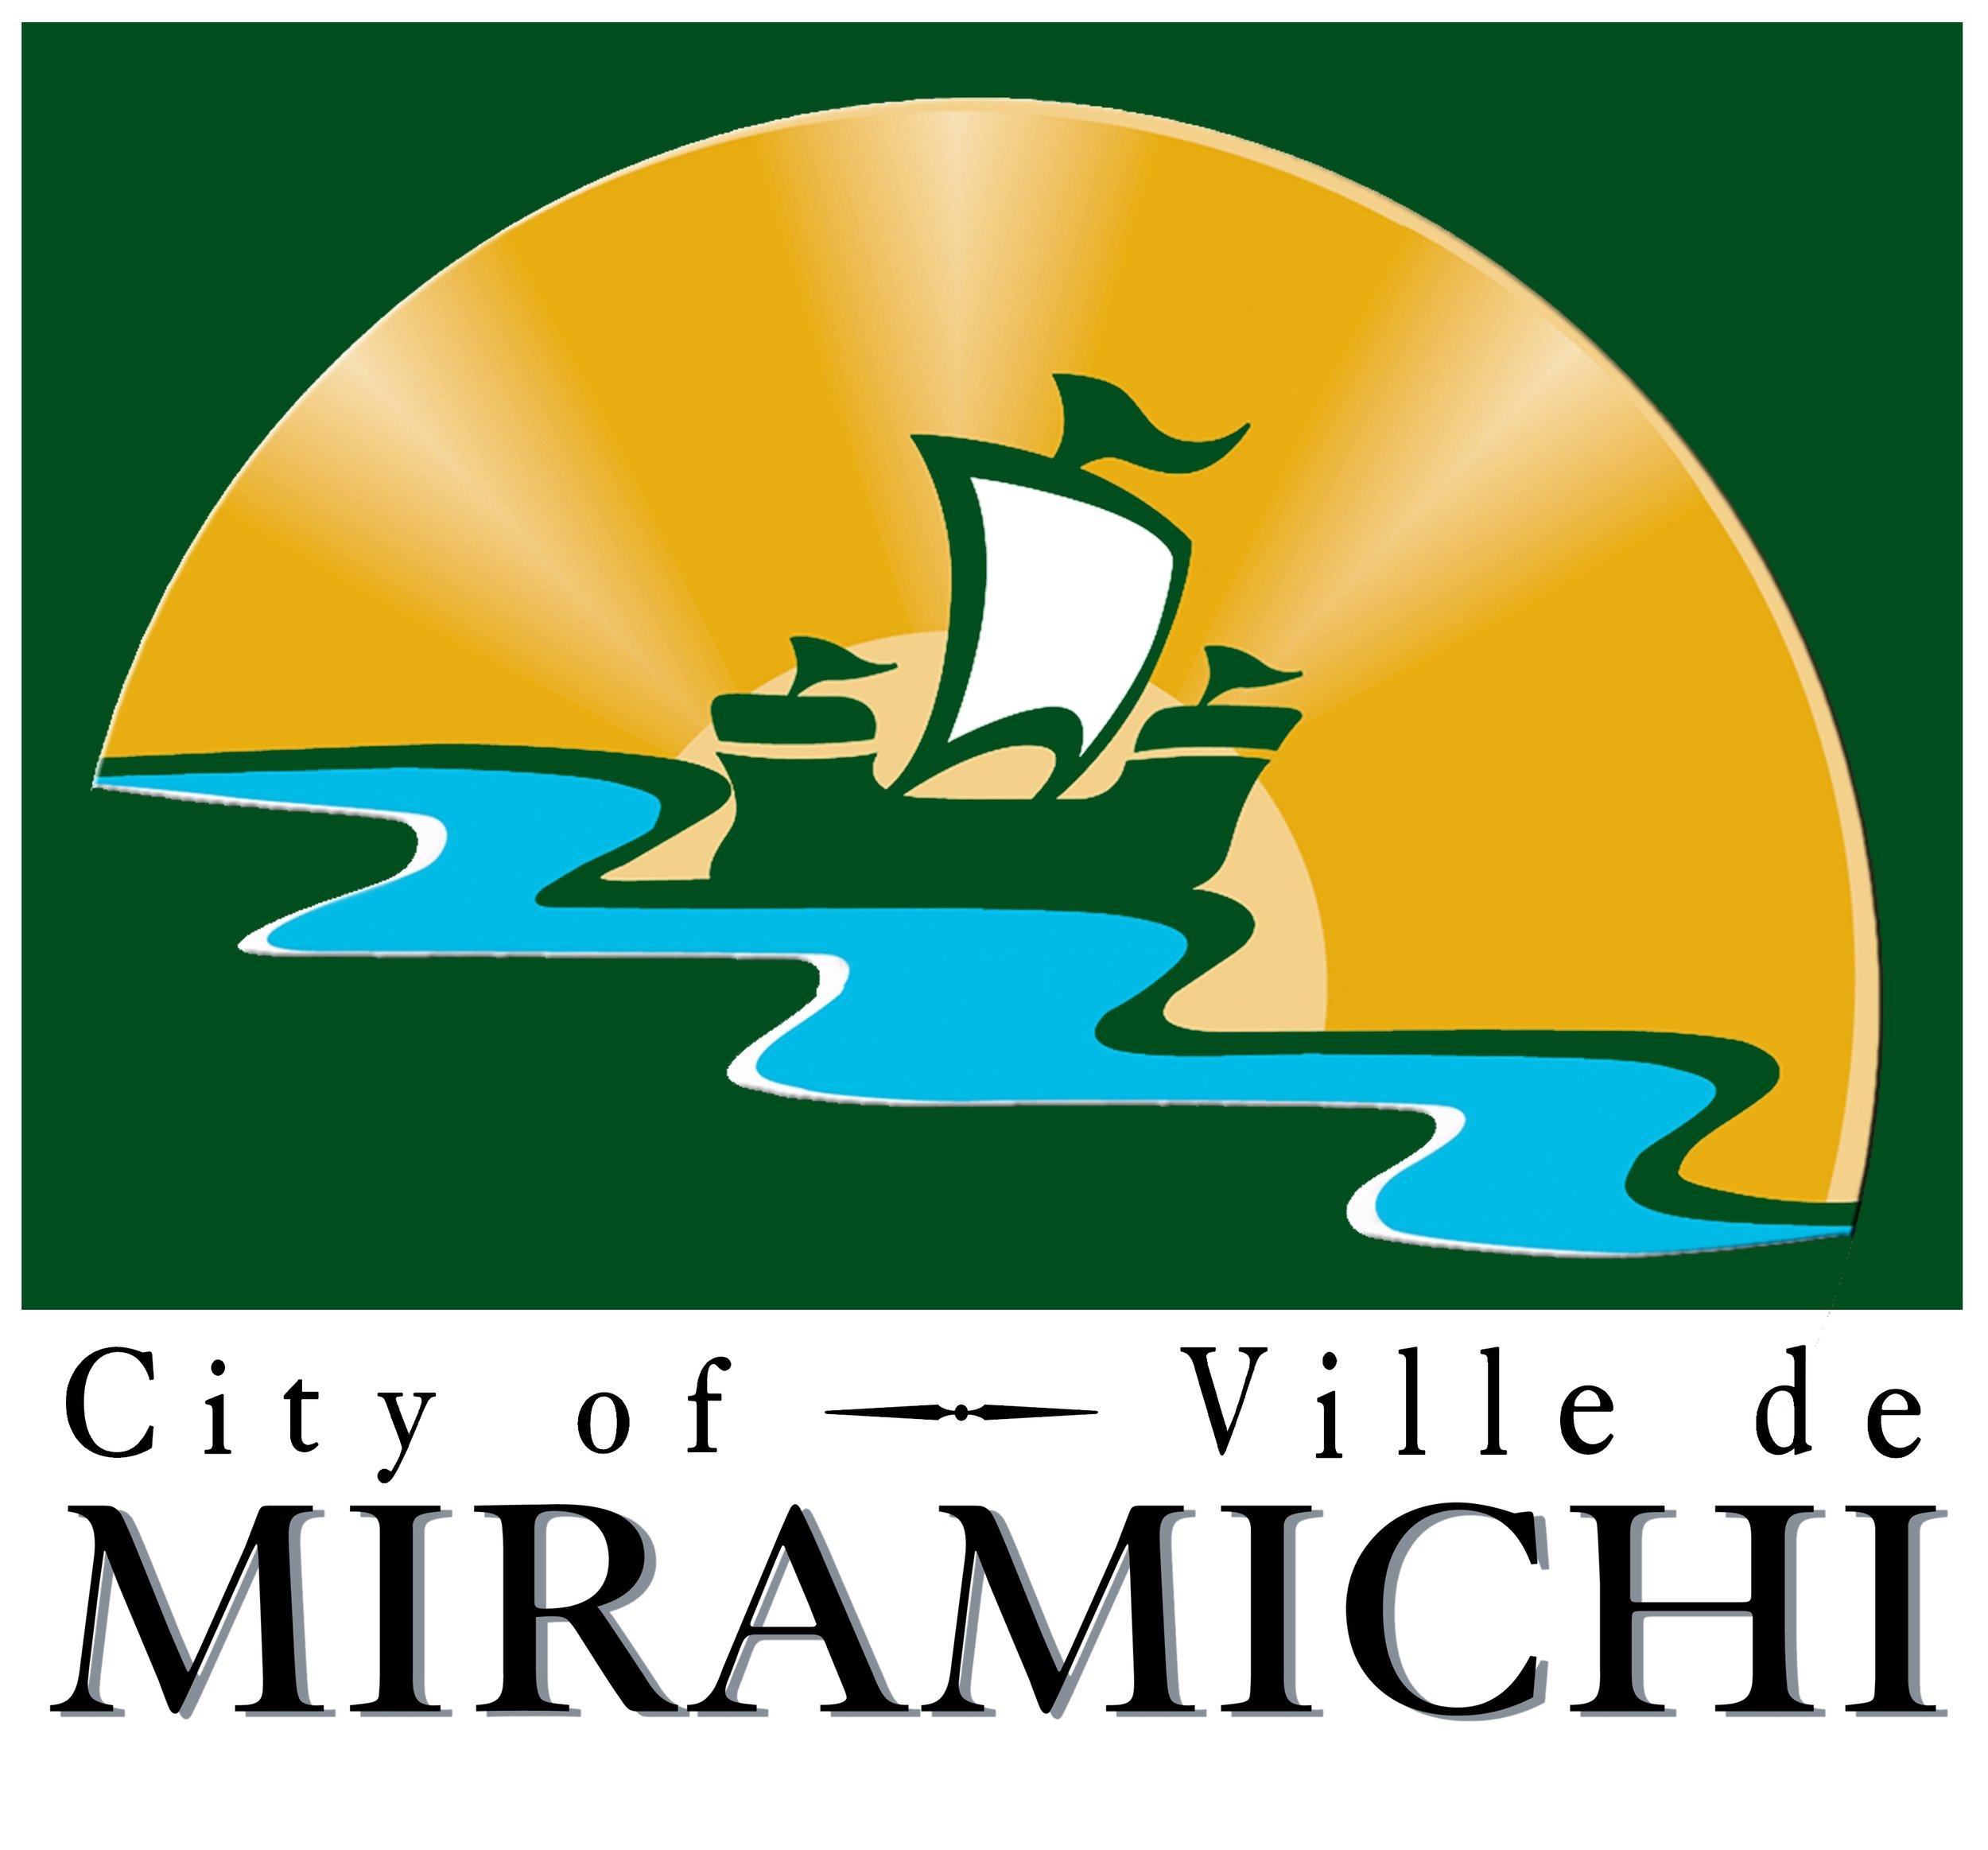 CITY OF MIRAMICHI LOGO1 (2).JPG